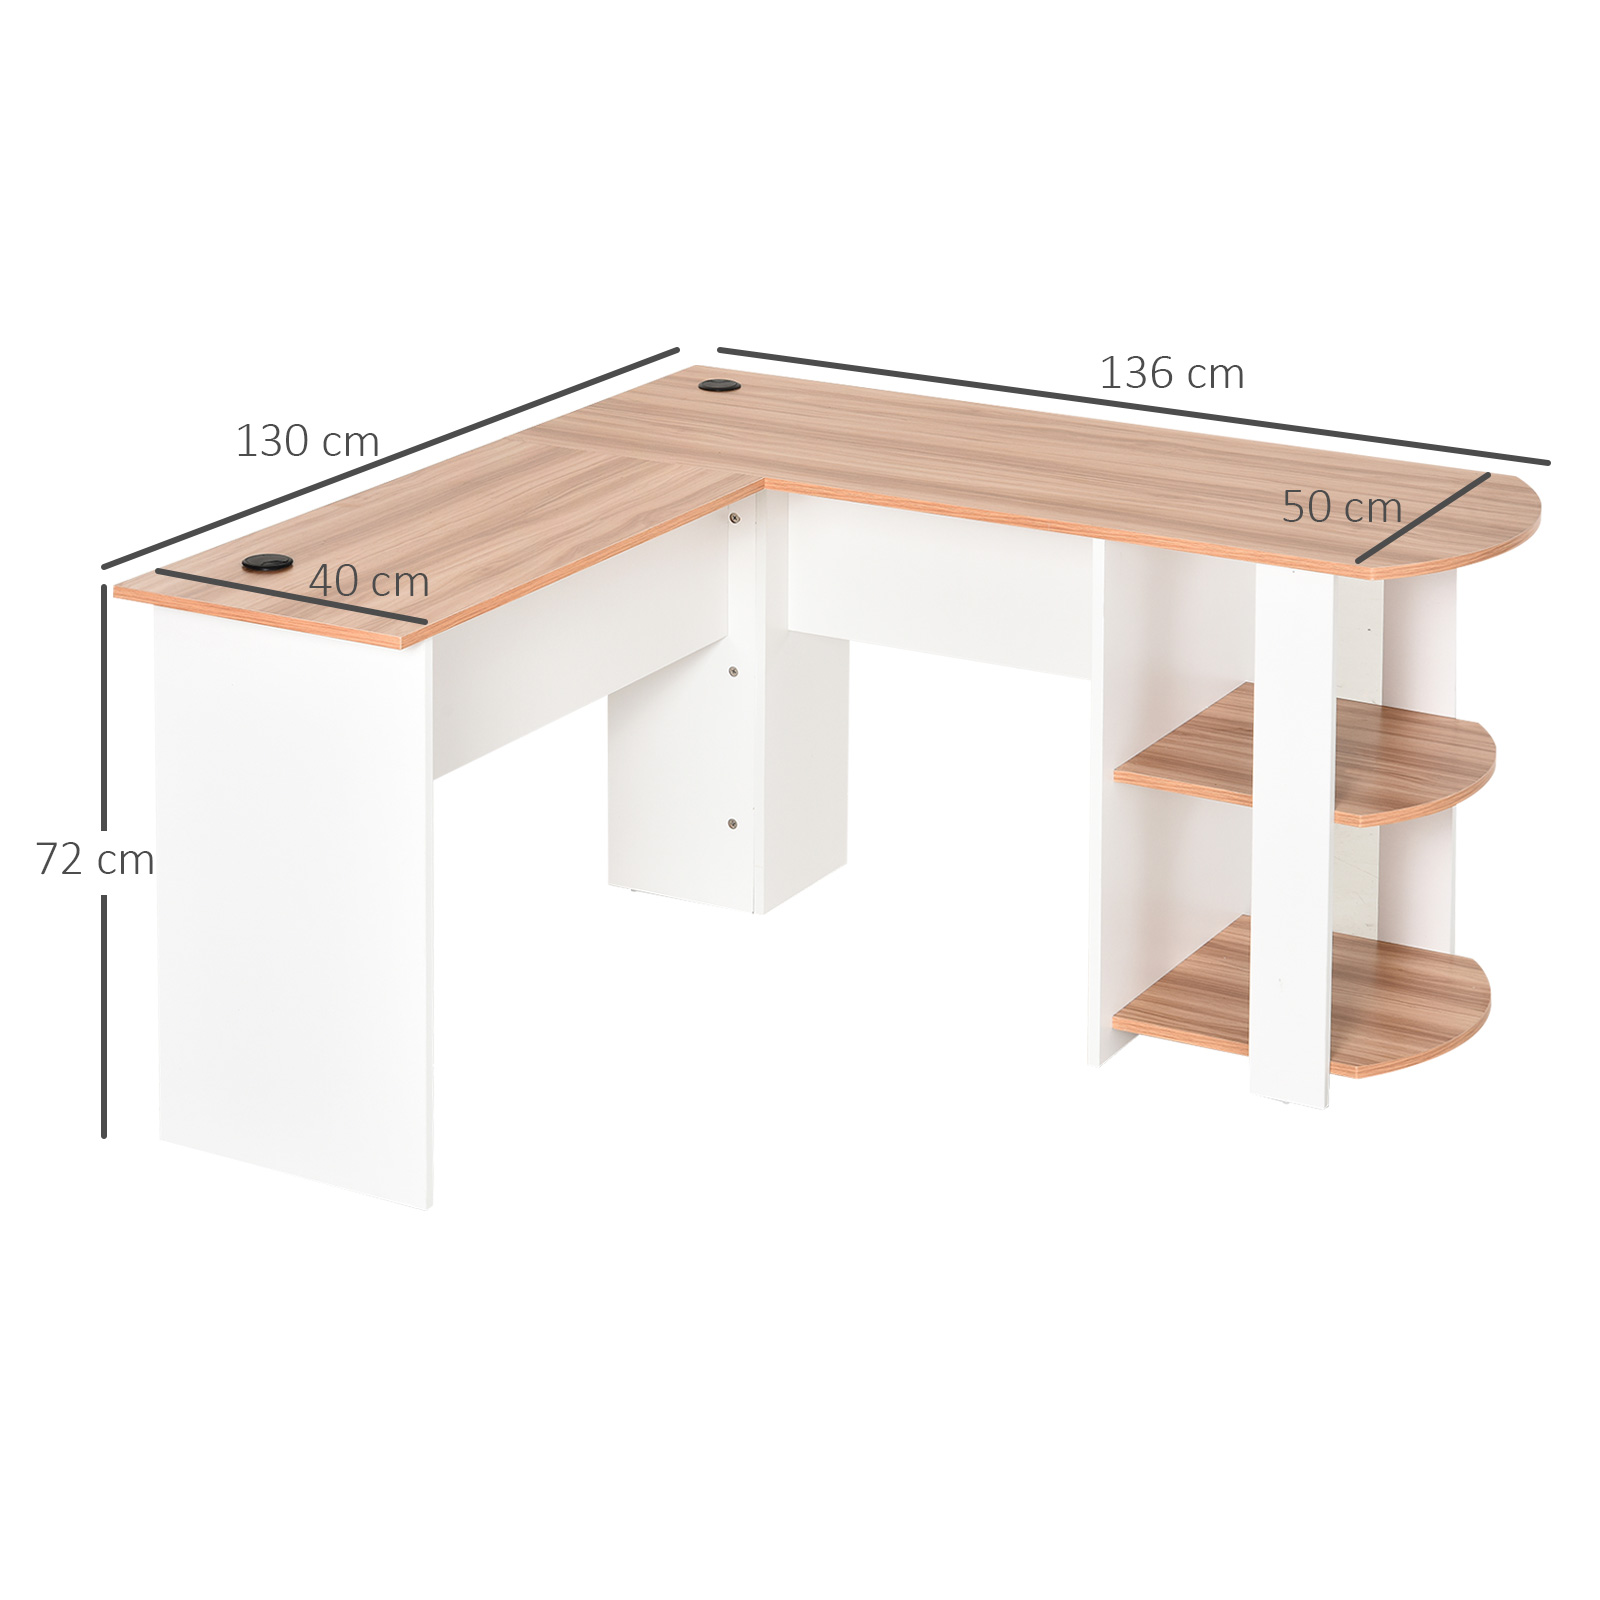 Mesa-de-Ordenador-PC-Escritorio-para-Oficina-Hogar-Esquinera-Forma-L-Madera miniatura 20